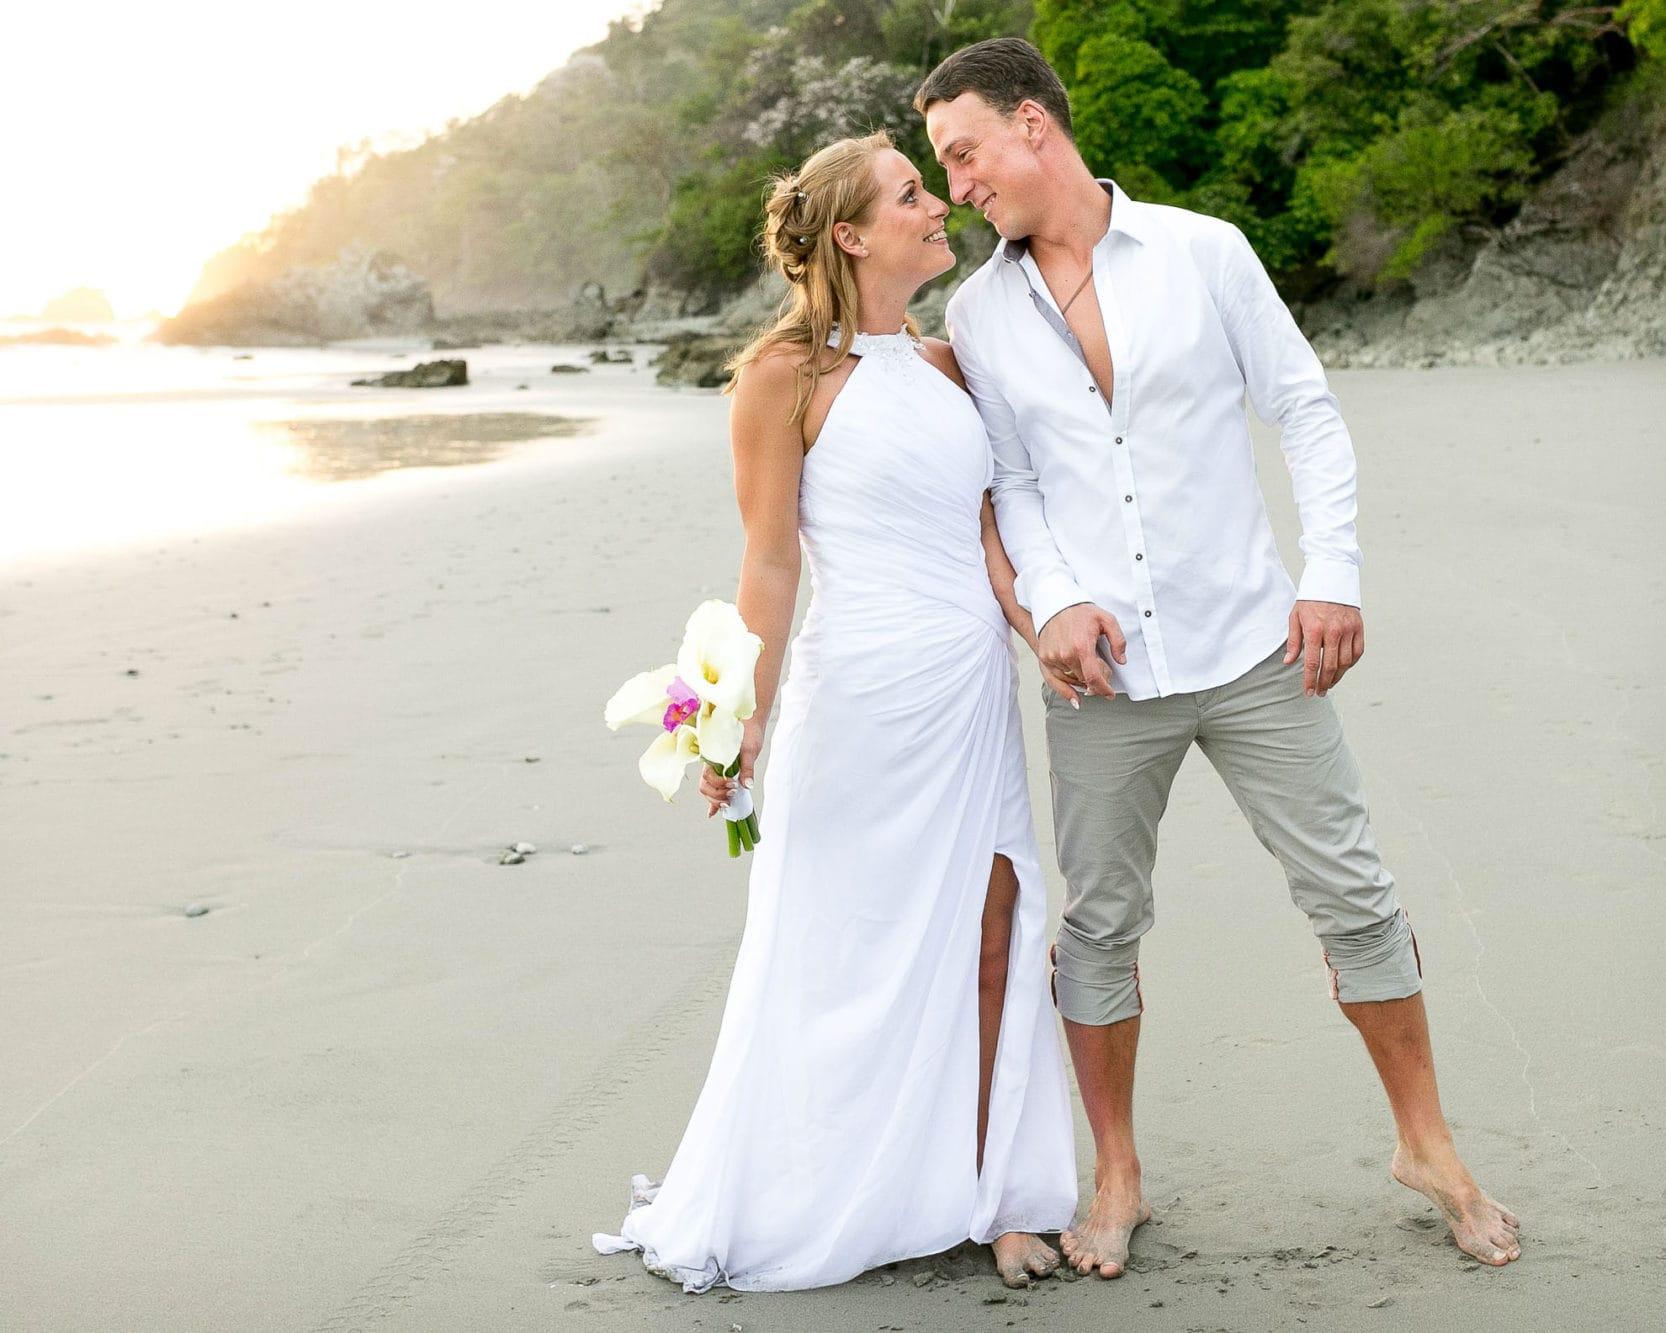 A simple yet elegant wedding on the beach